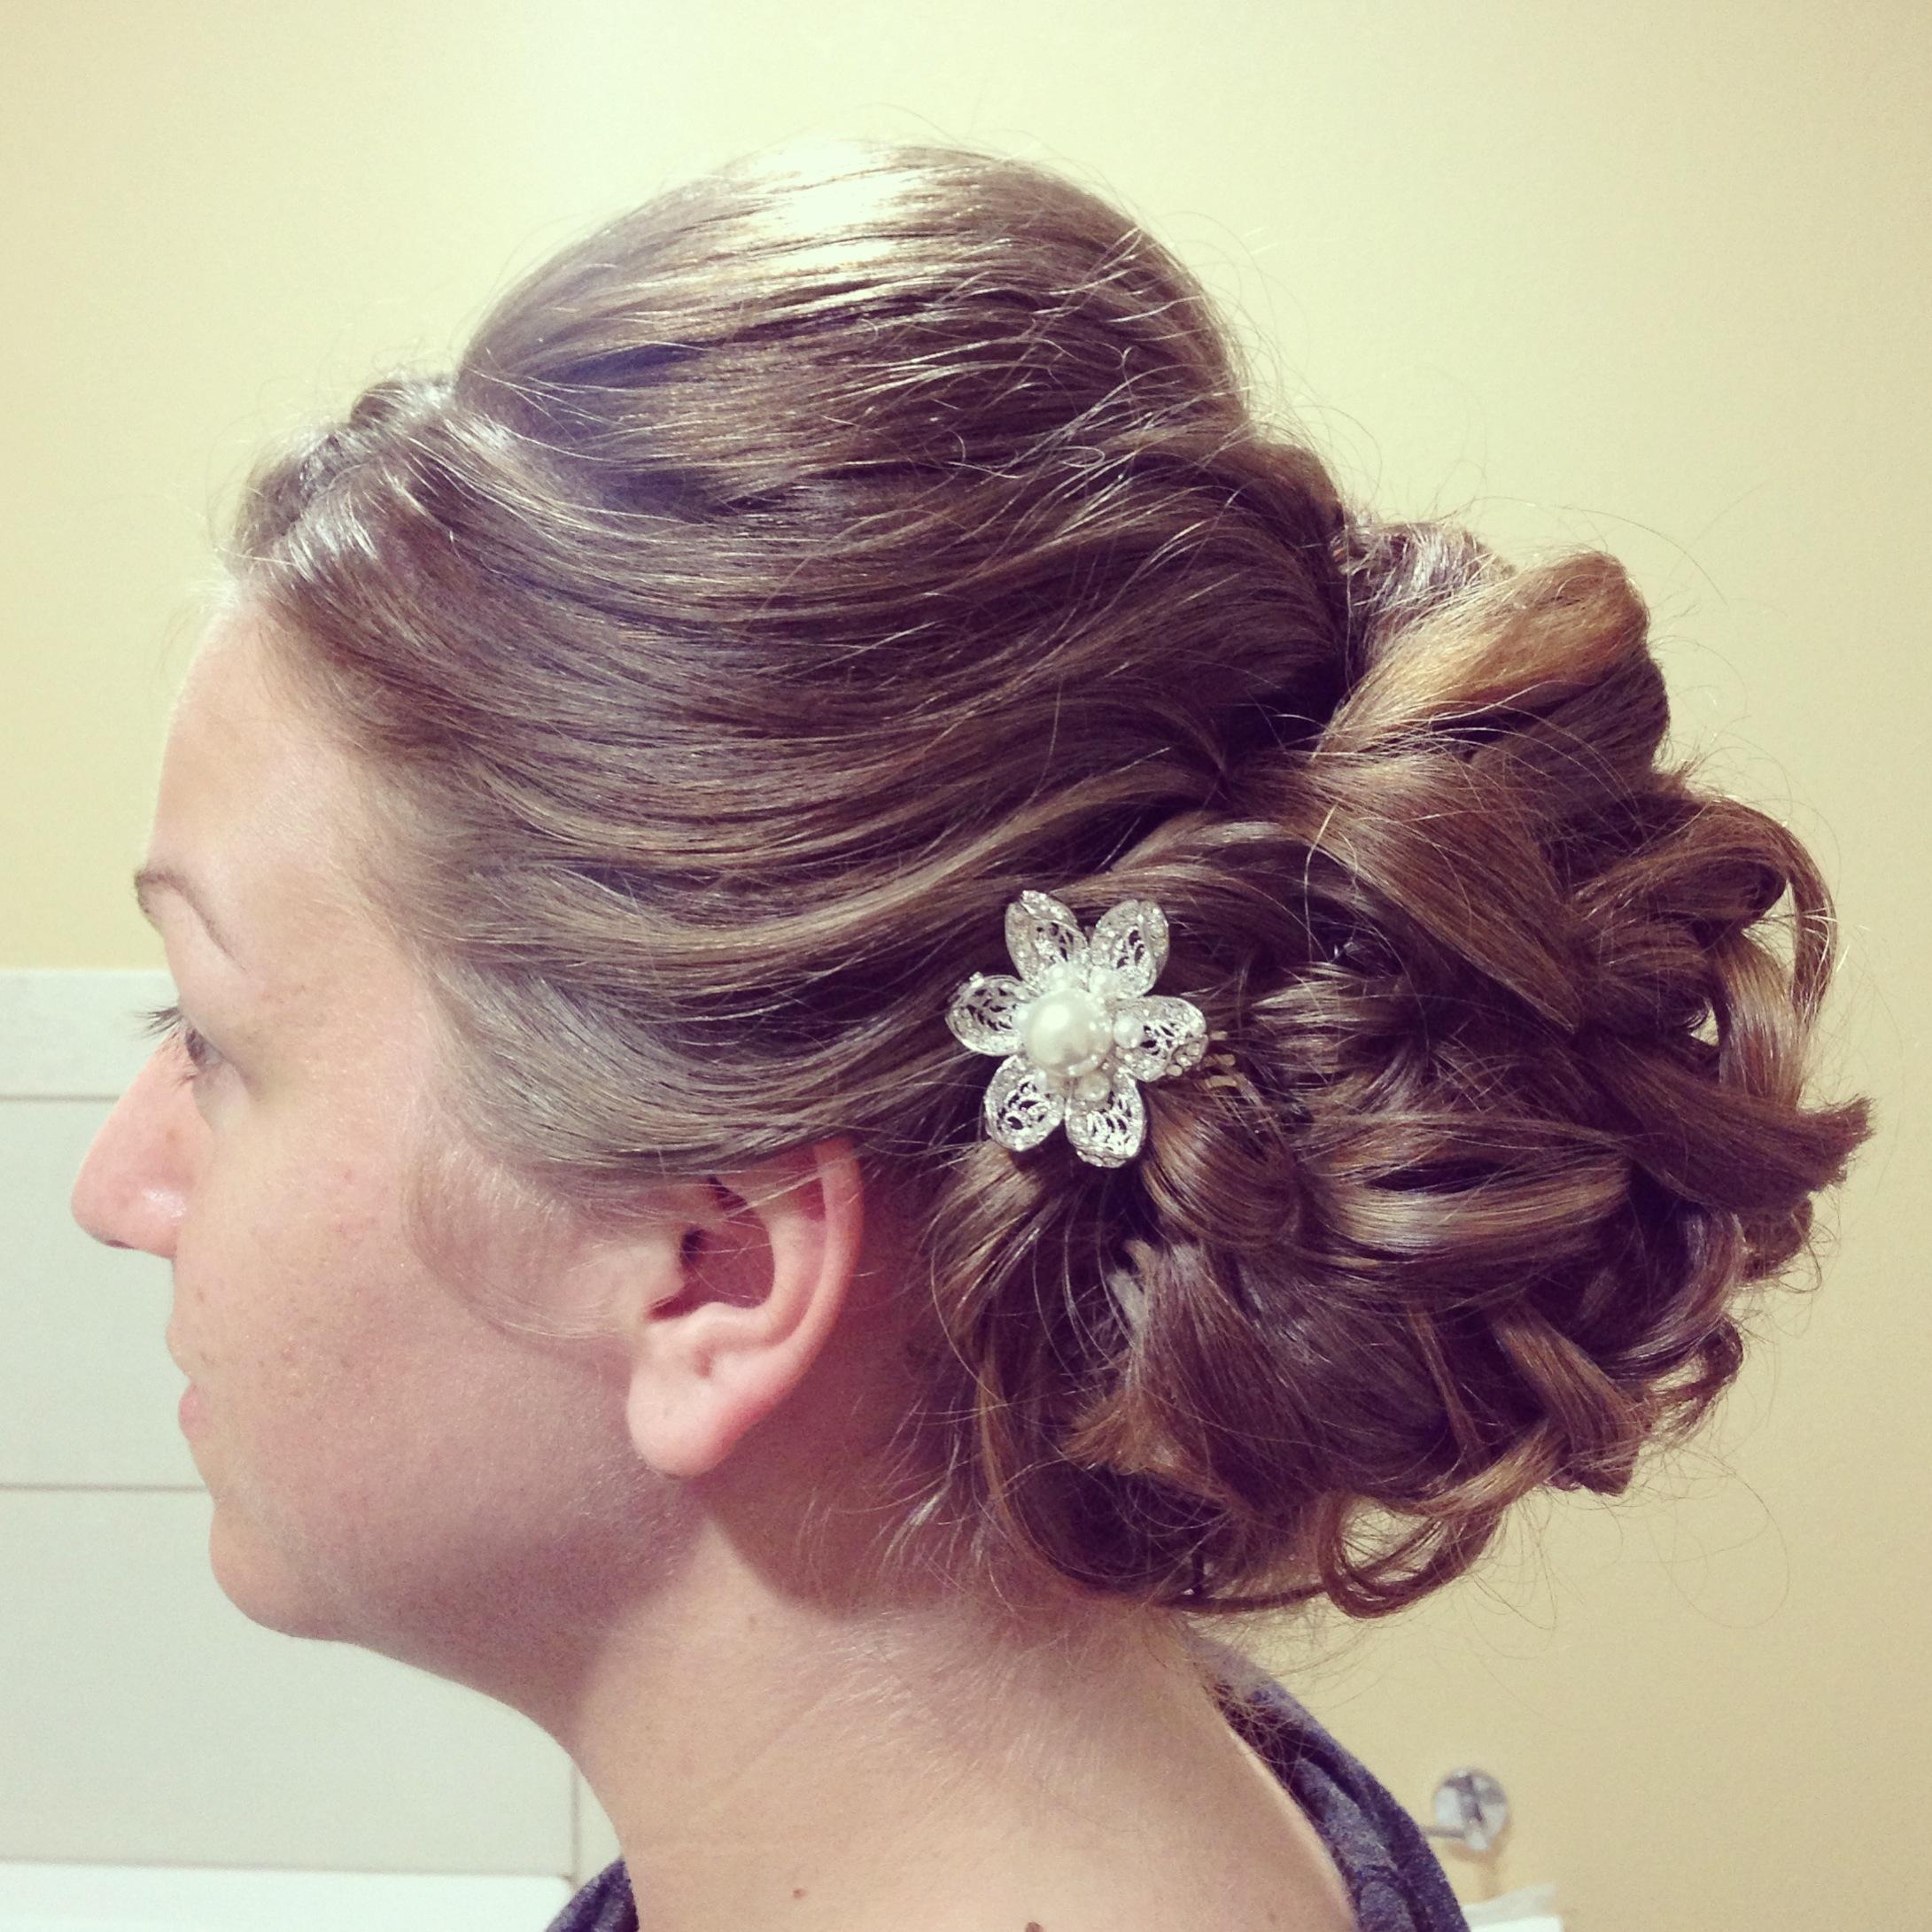 hair-teasemakeup3